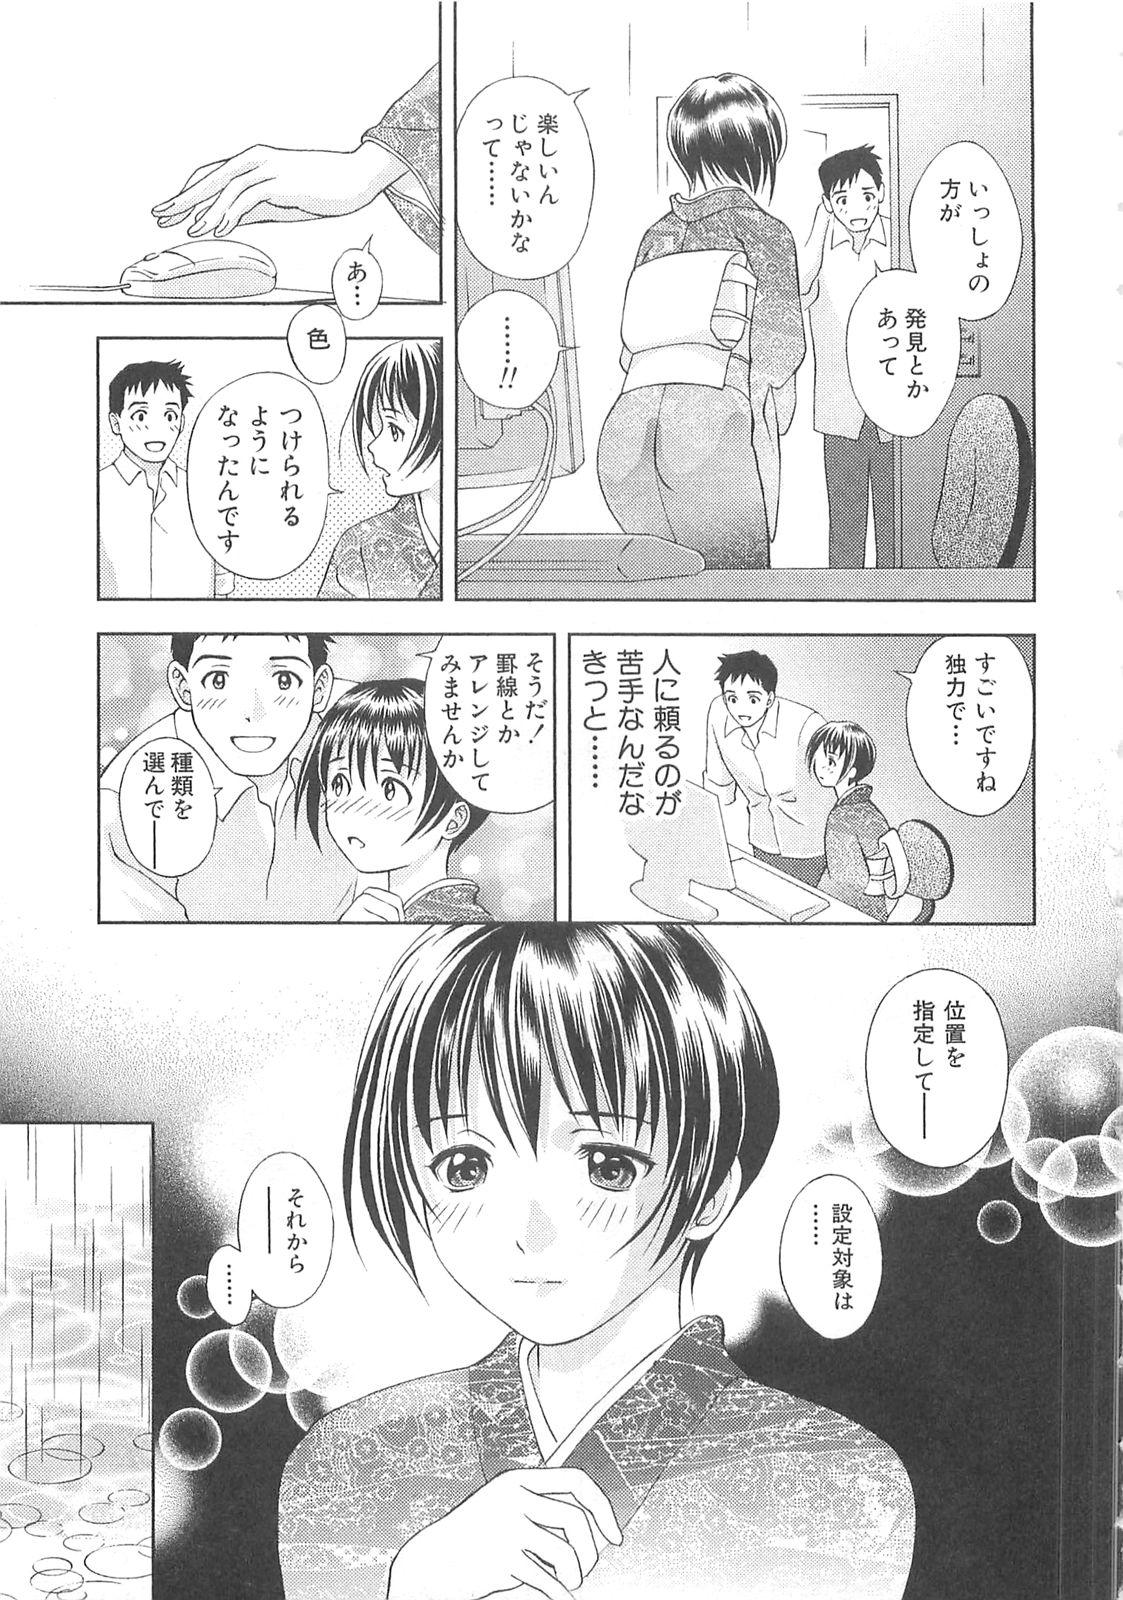 Tenshi no Kyuu - Angel's Pretty Hip 111